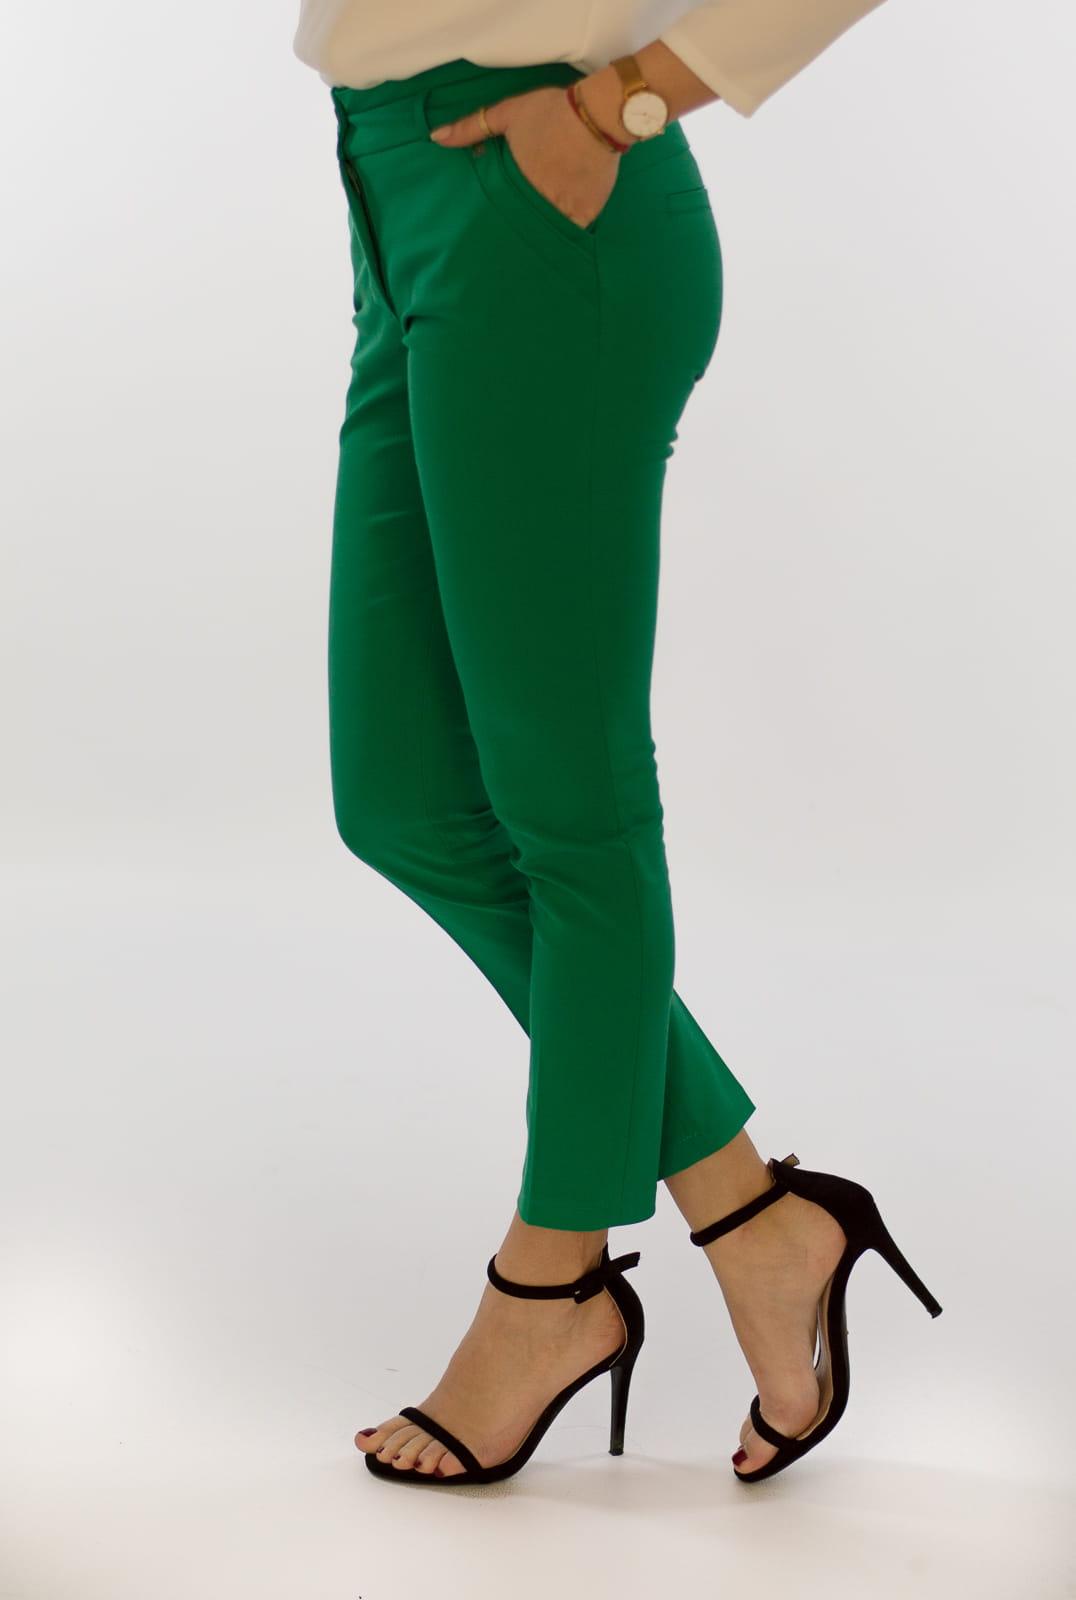 db5a23004a0d2f Eleganckie spodnie damskie BB zielone 7/8 - Isuka. 27946_24655. promocja.  27946_24655; 27946_24656; 27946_24657; 27946_24658; 27946_24659